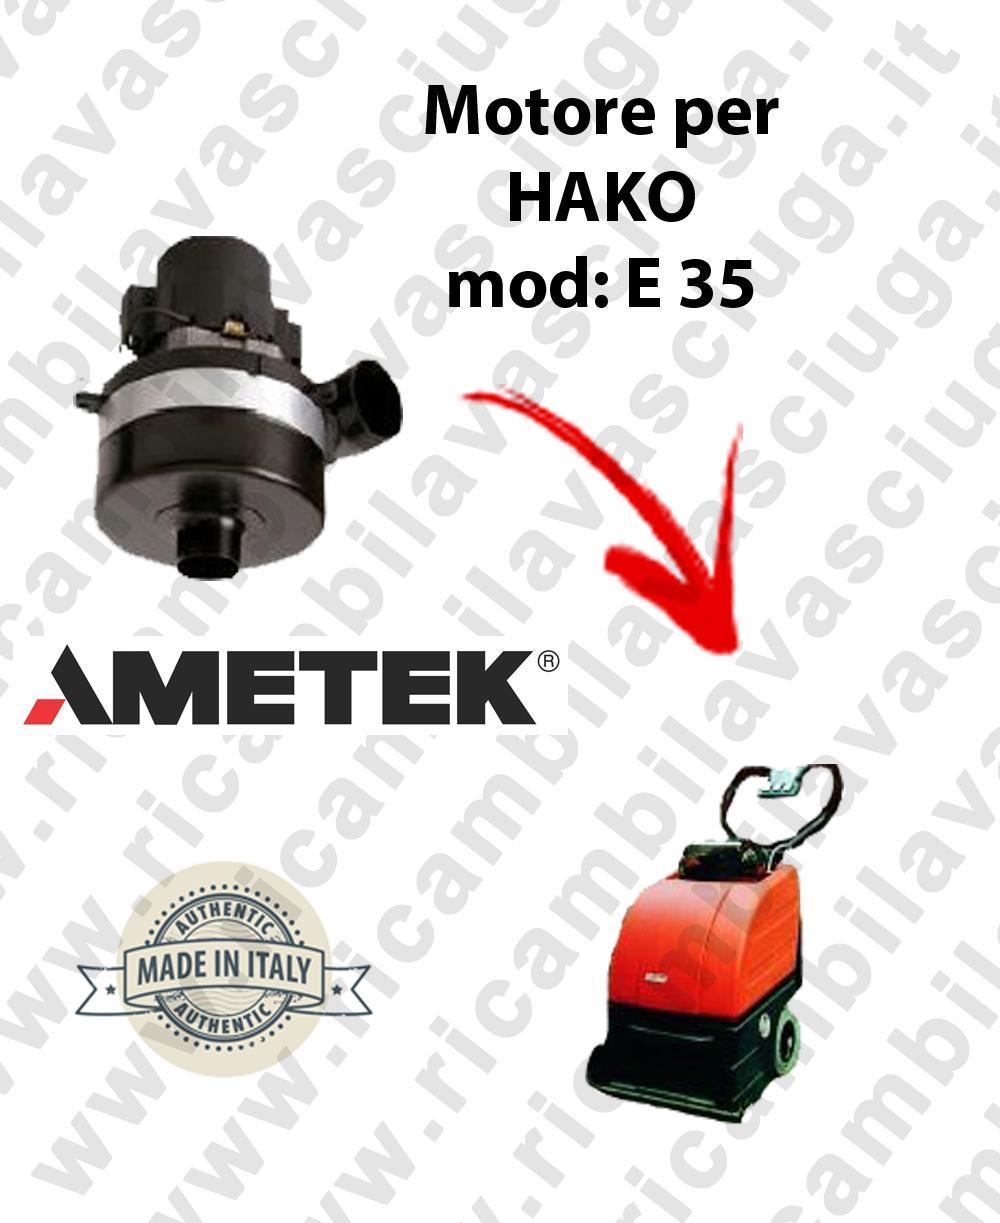 E 35 Saugmotor AMETEK für Scheuersaugmaschinen HAKO